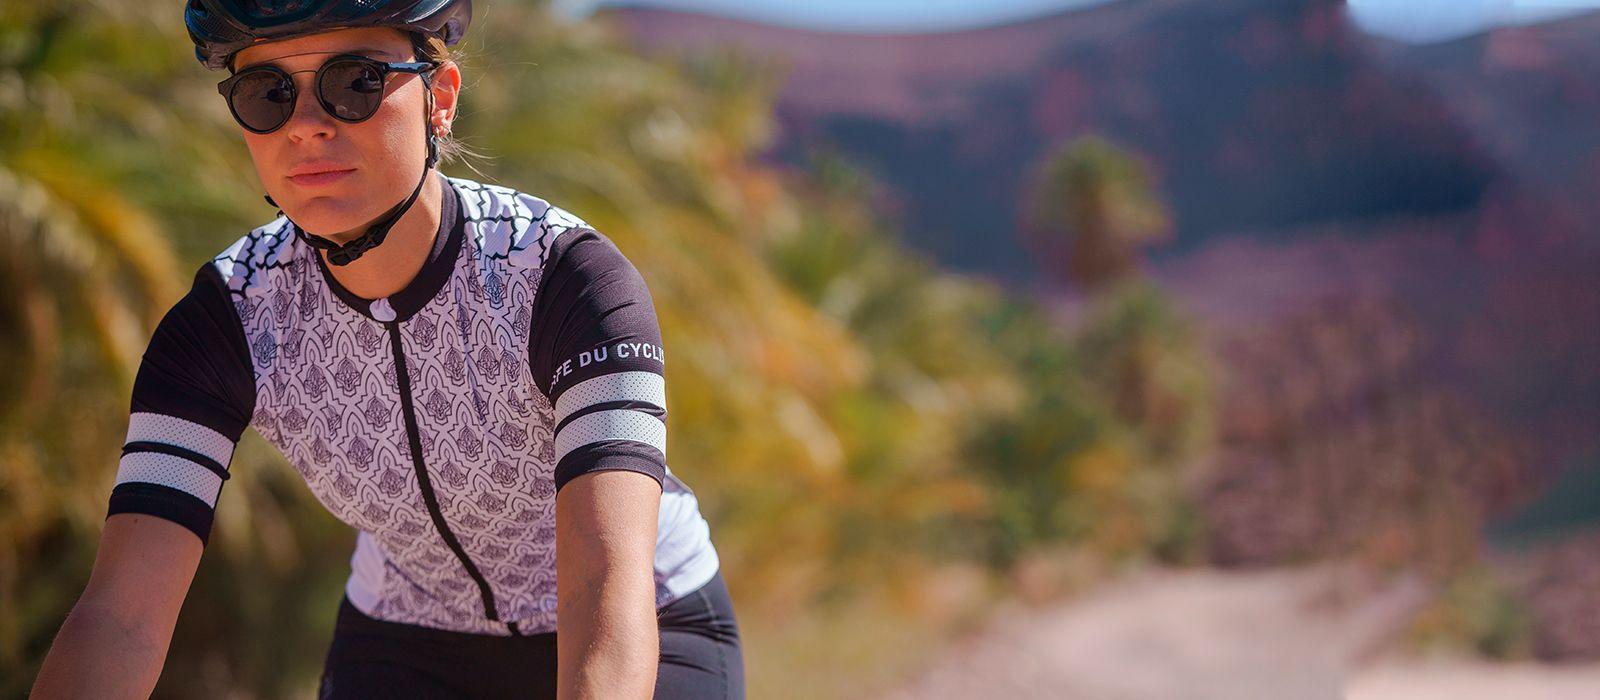 Dámský cyklistický dres, cyklo dres na kolo s krátkým rukávem Tichka navy blue